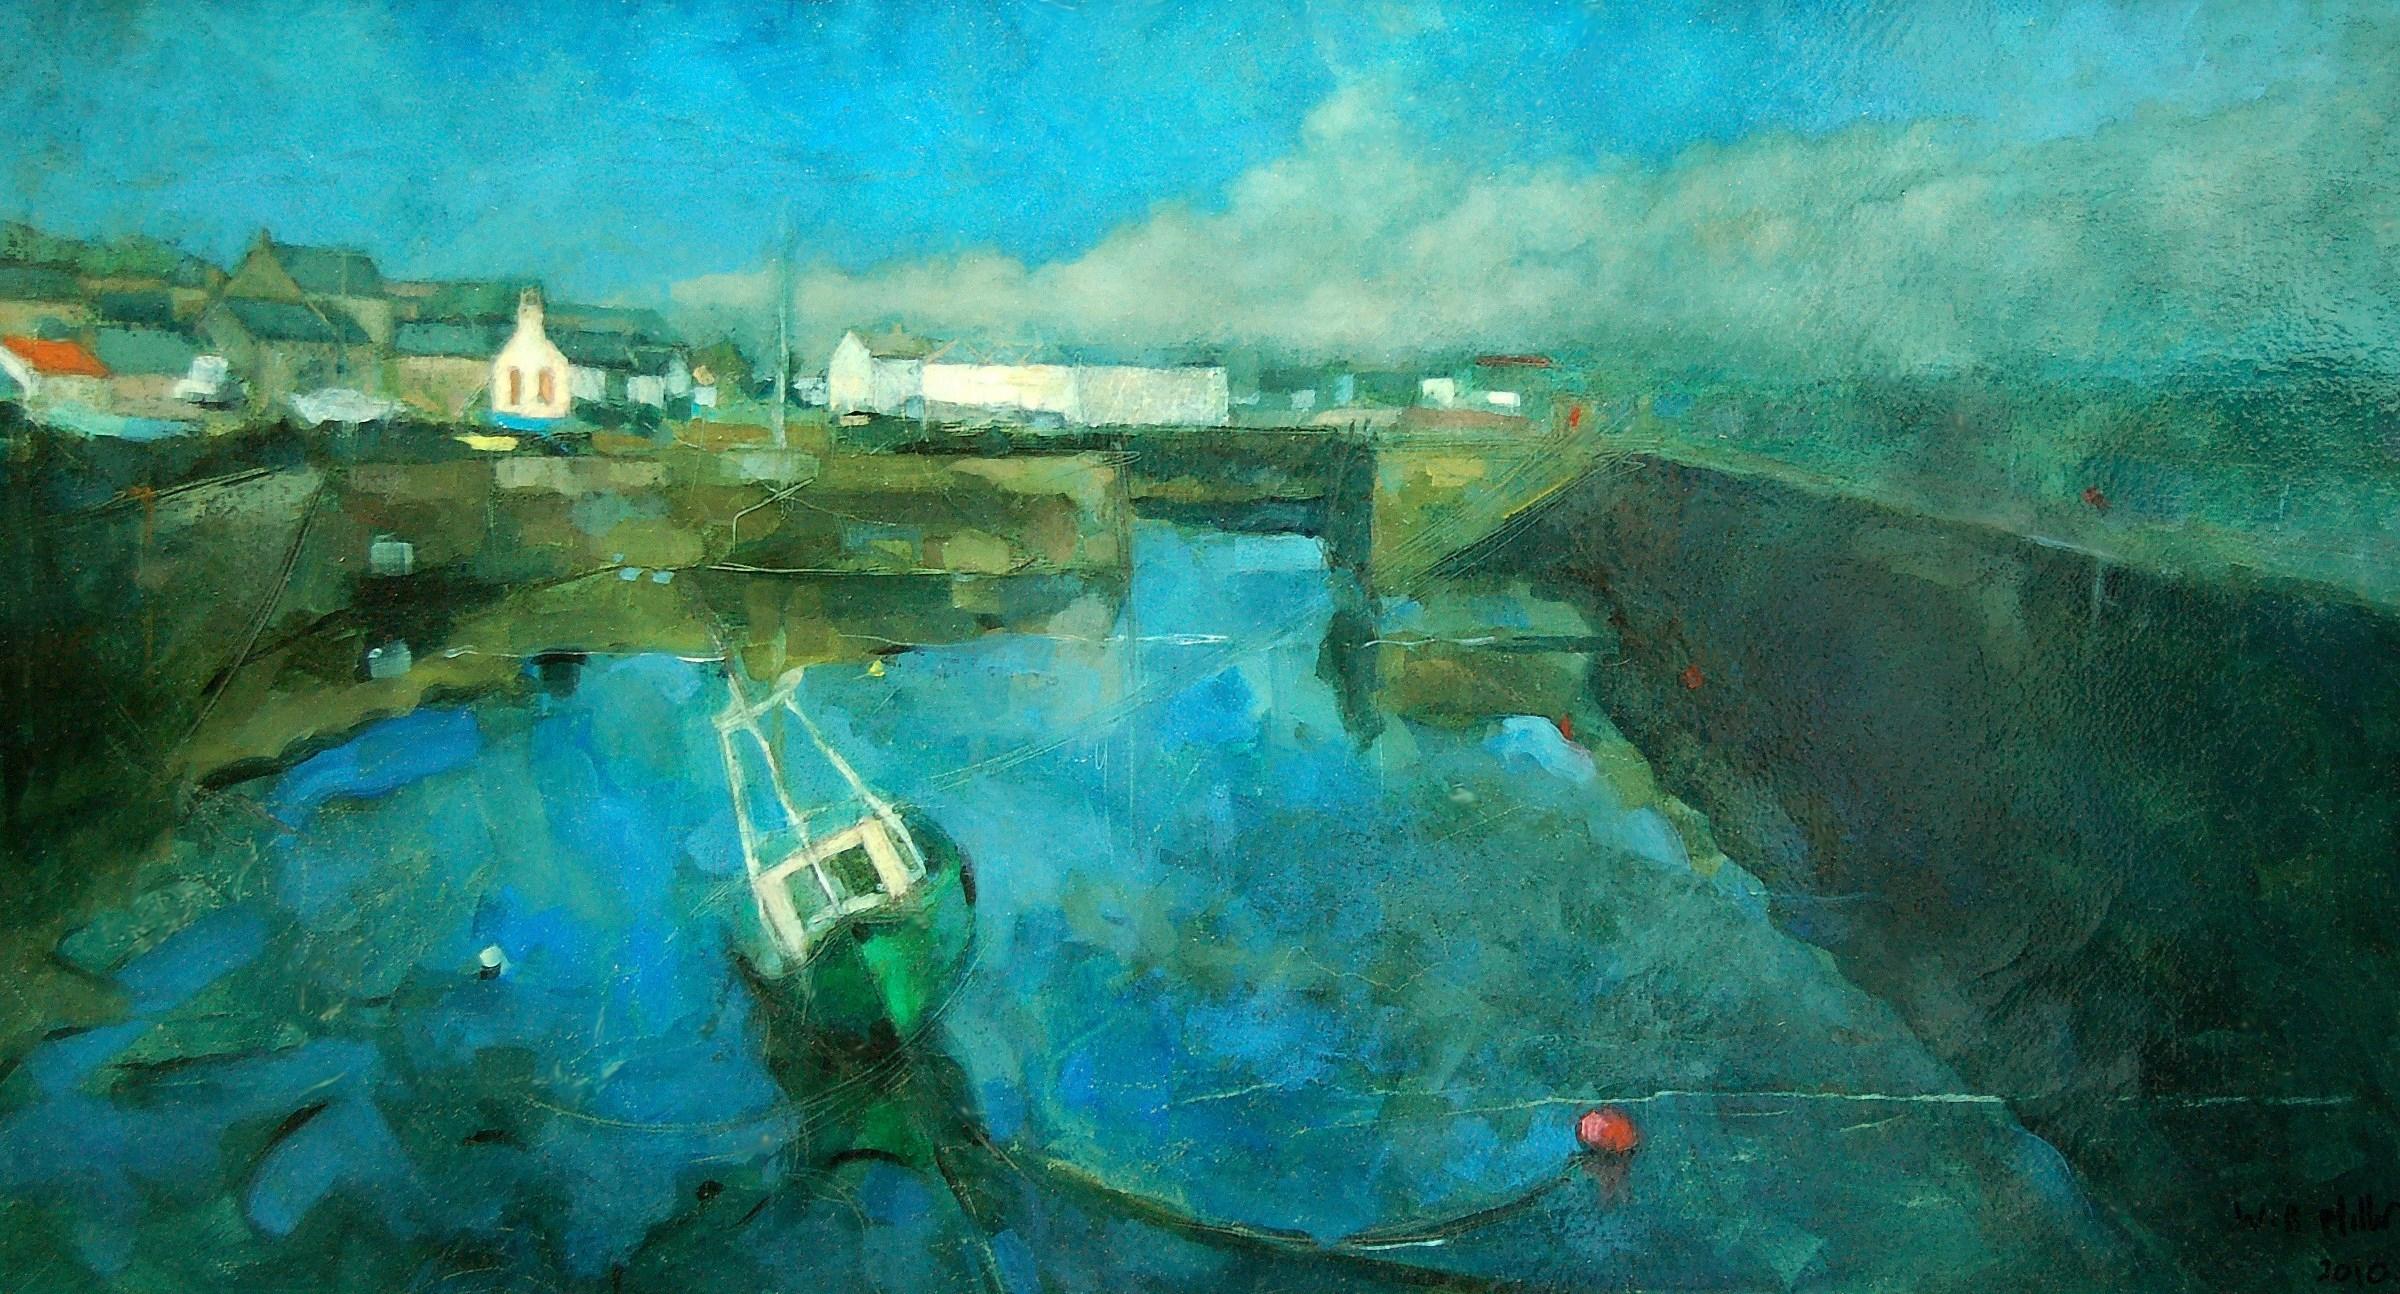 Johnshaven Harbour oil painting by Scottish artist William Brian Miller